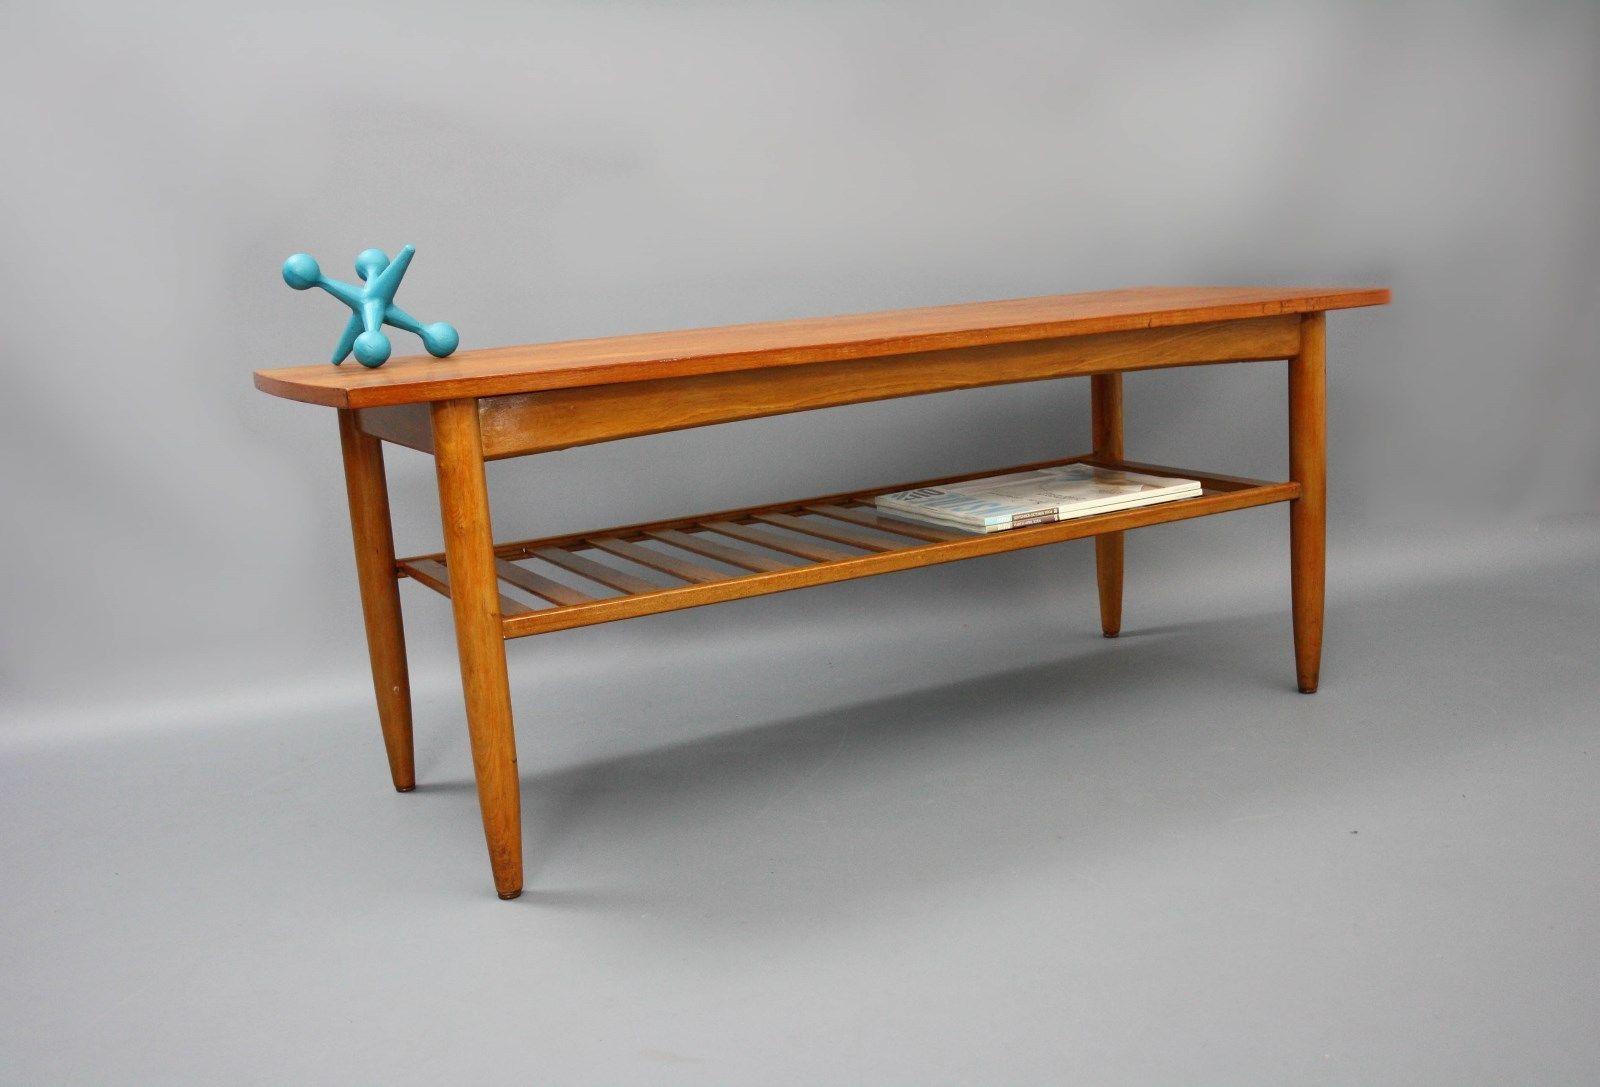 Items In 360 Modern Furniture Store On Ebay Modern Furniture Modern Furniture Stores Furniture [ 1087 x 1600 Pixel ]